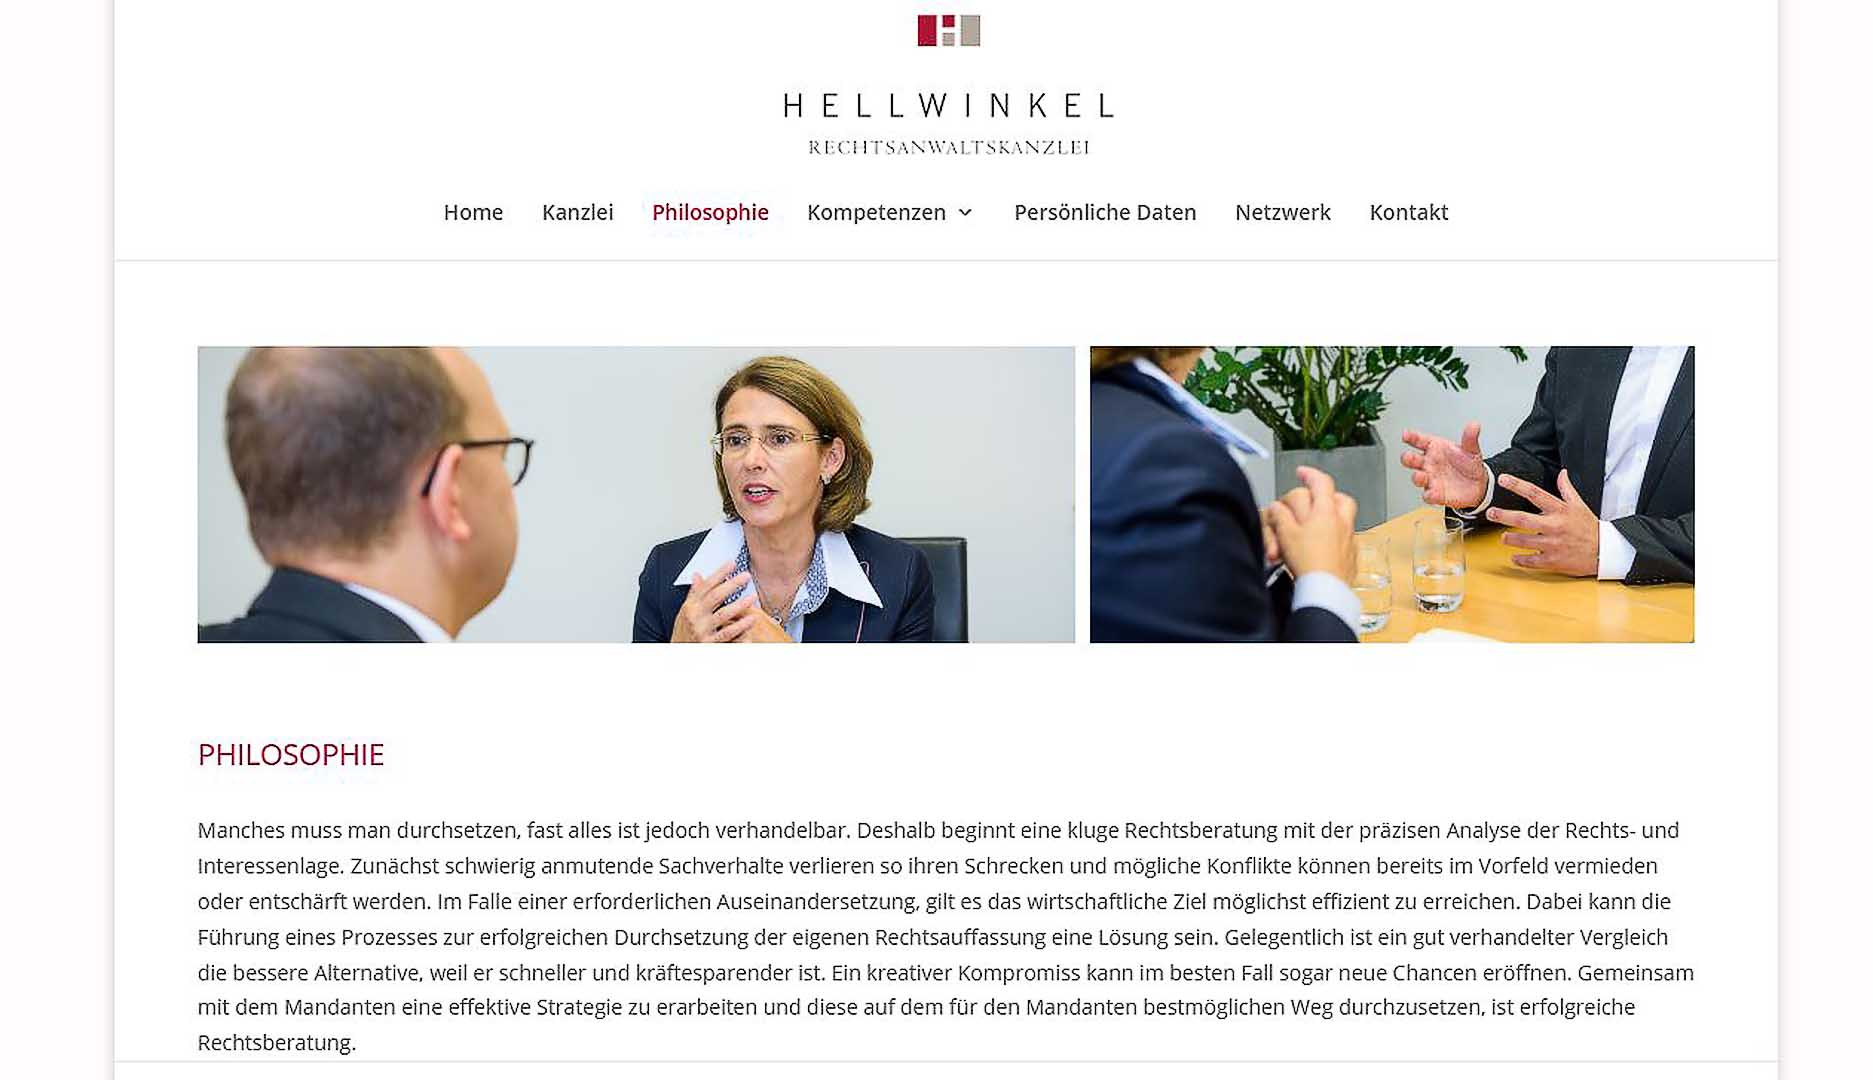 firmenfotos-businessfotos-weinheim-mannheim-heidelberg-fotograf